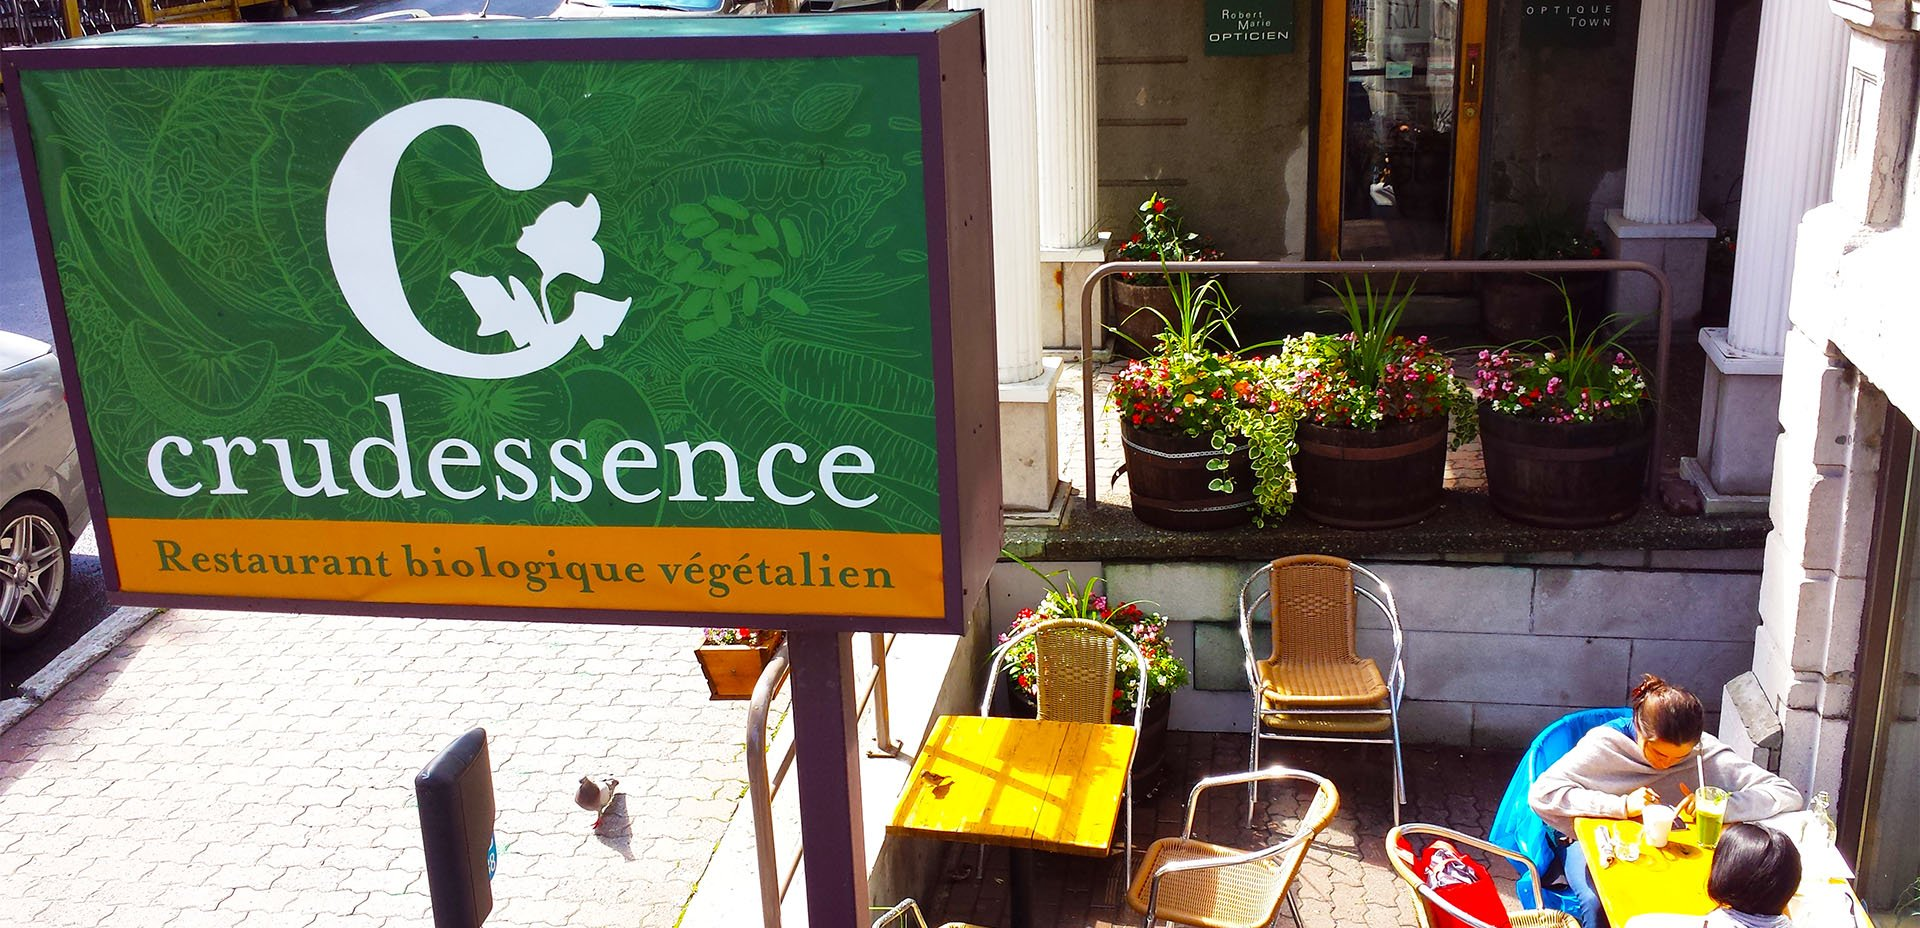 Ristorante crudista Crudessence a Montreal